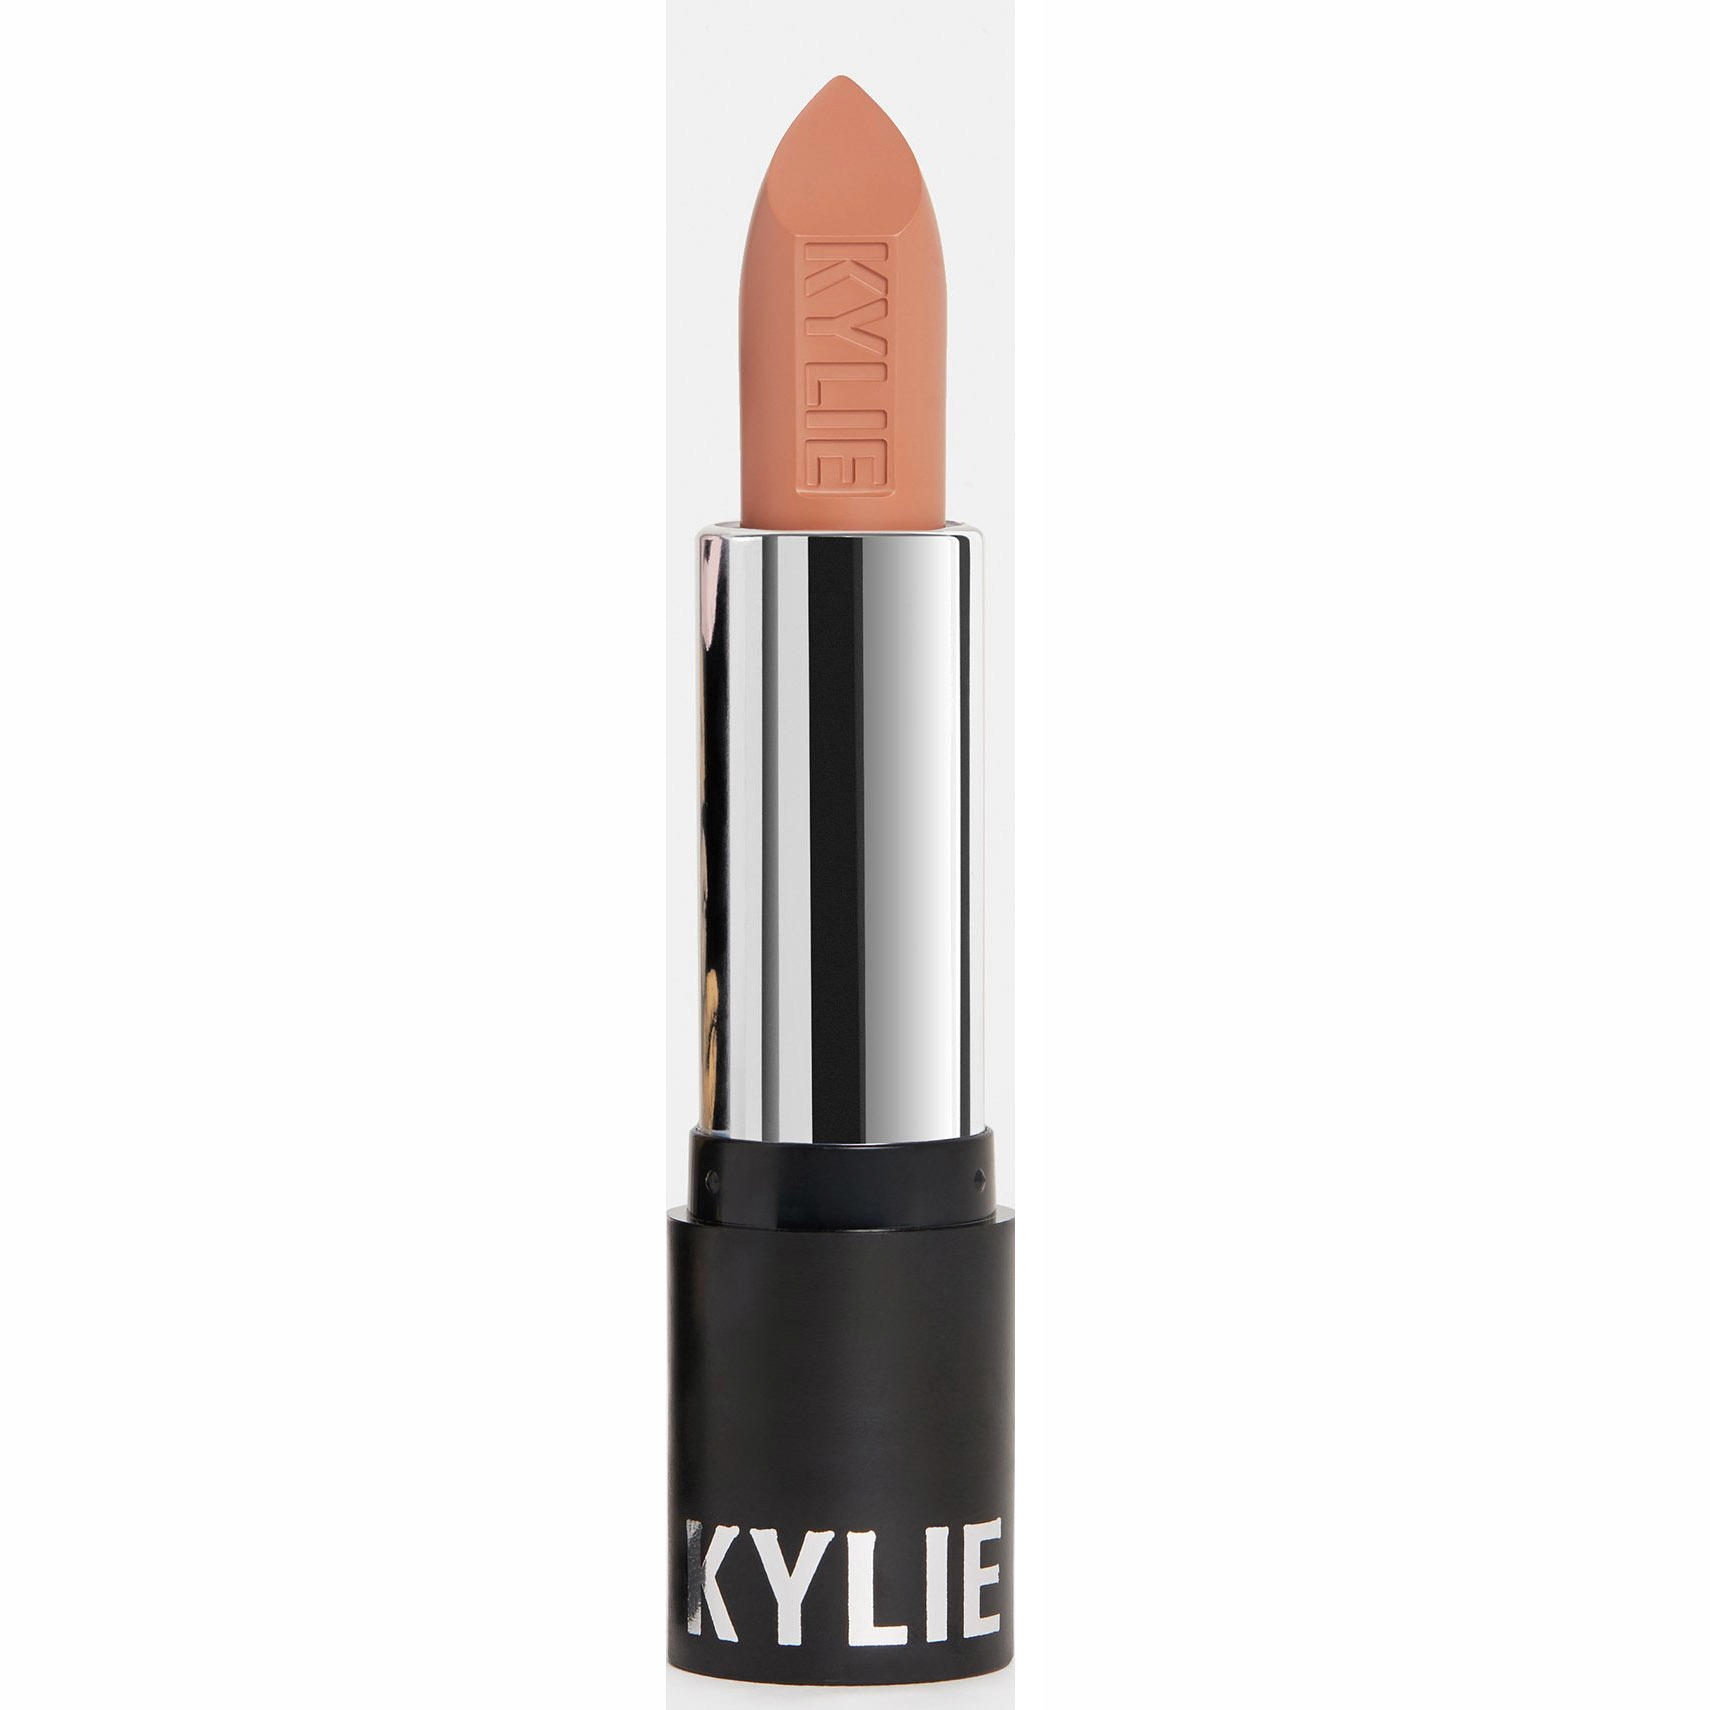 Kylie Cosmetics Matte Lipstick Nova